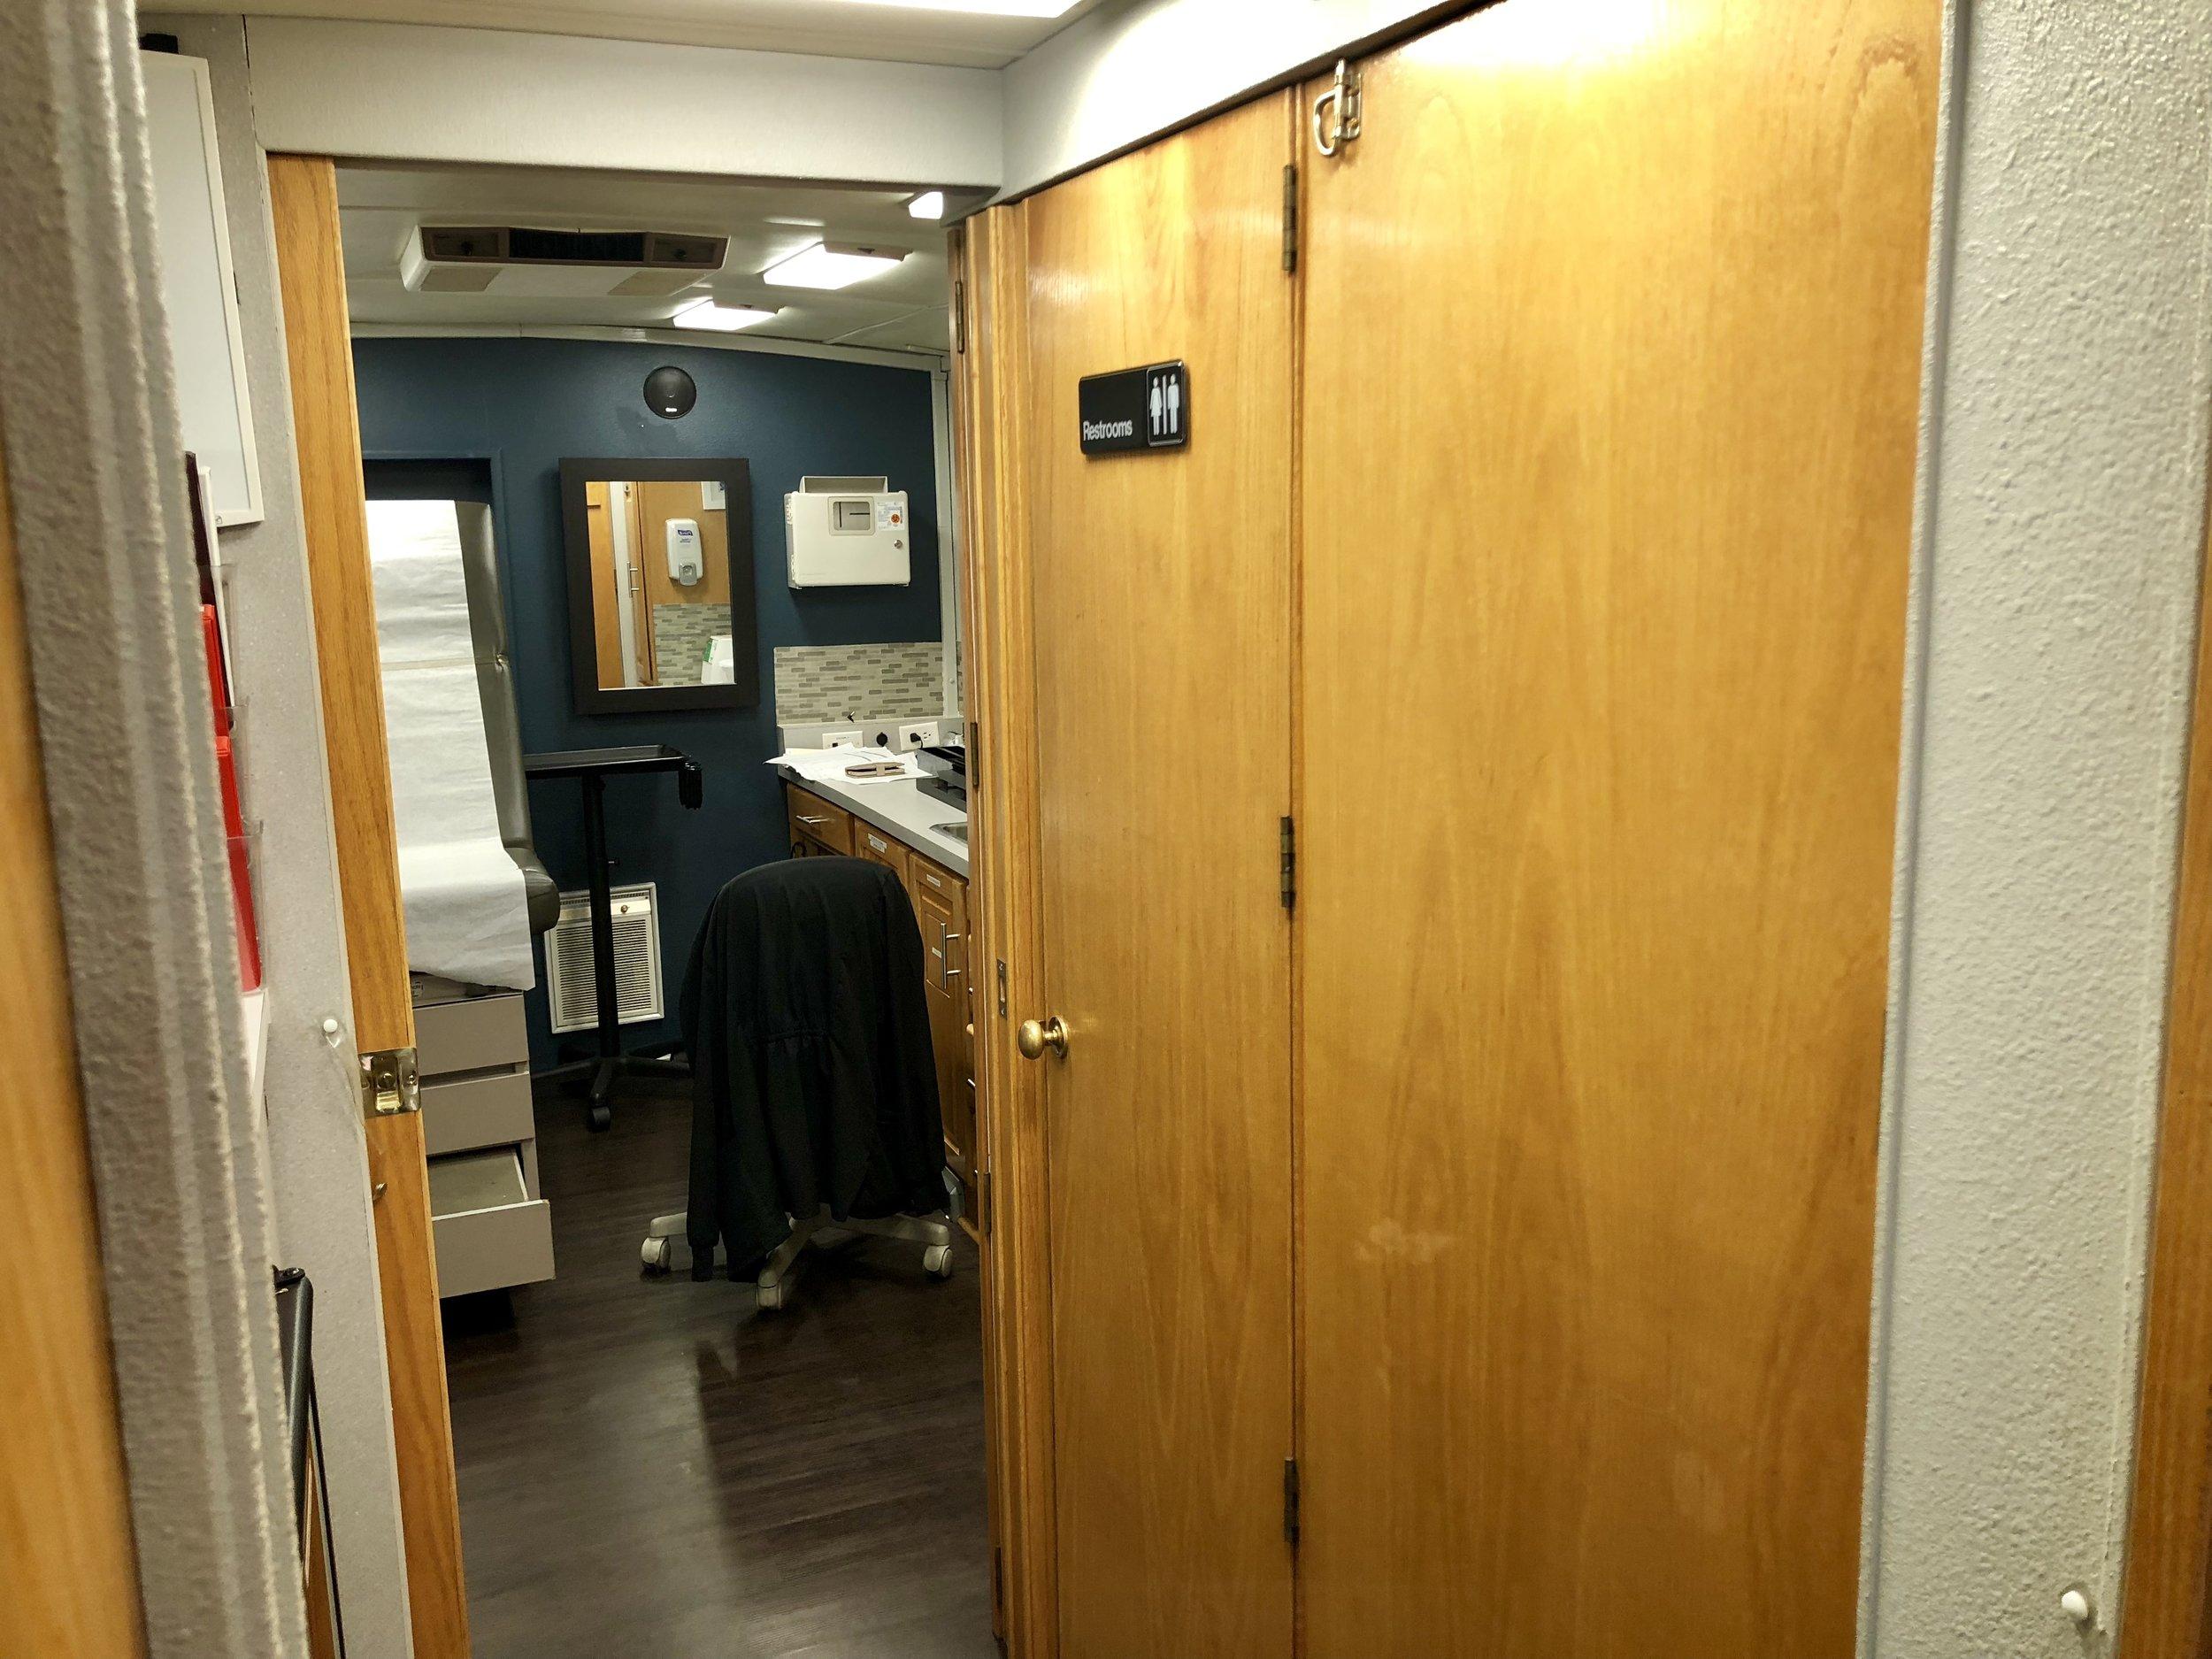 Hallway into back exam room